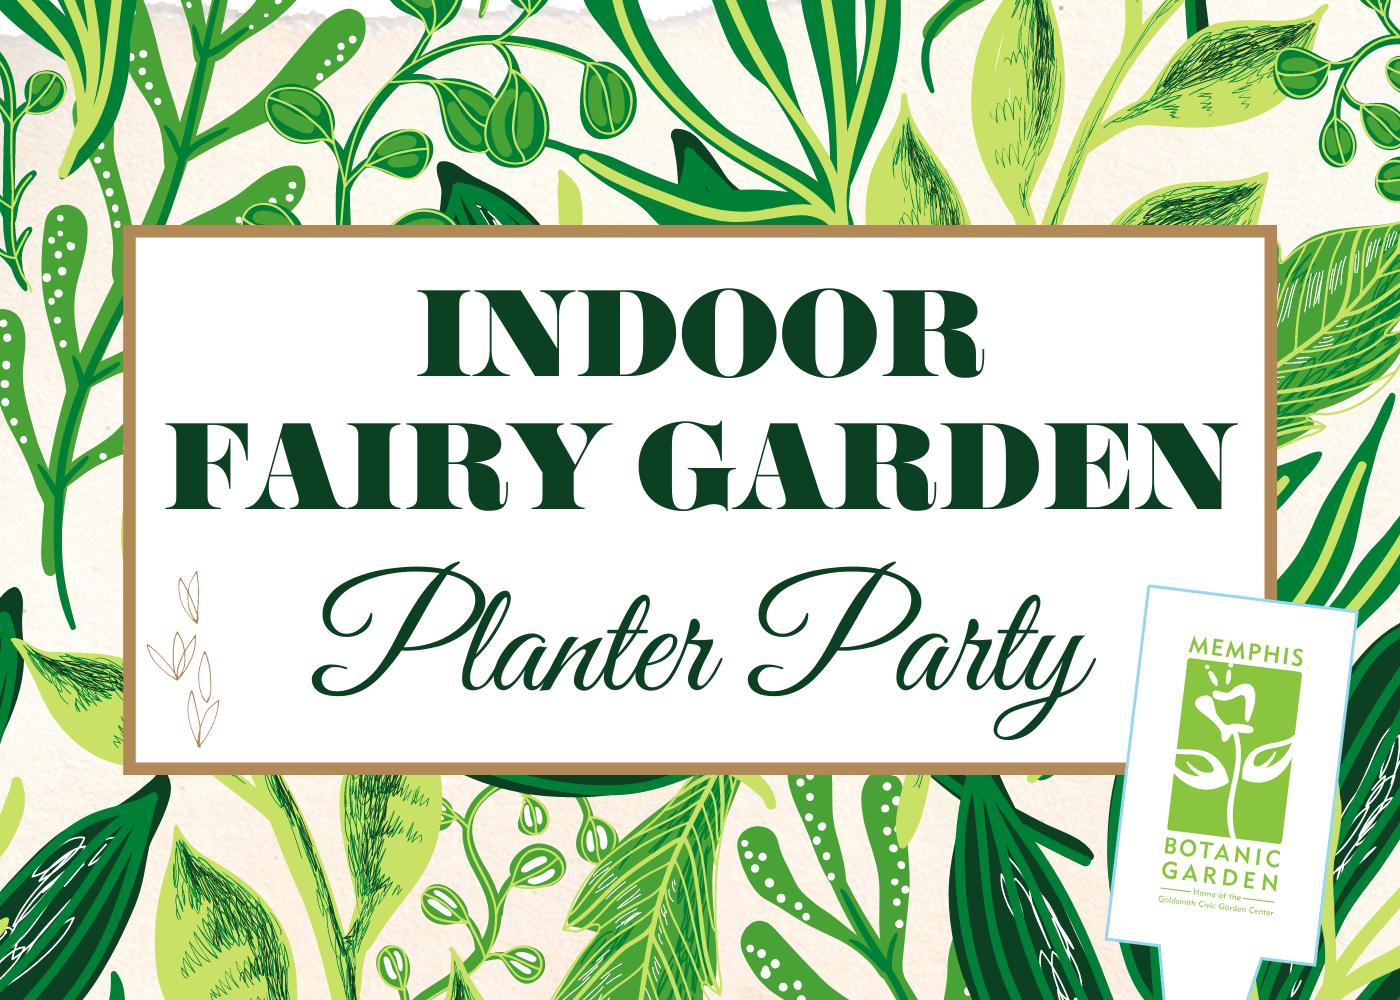 Indoor Fairy Garden Planter Party at the Garden August 20